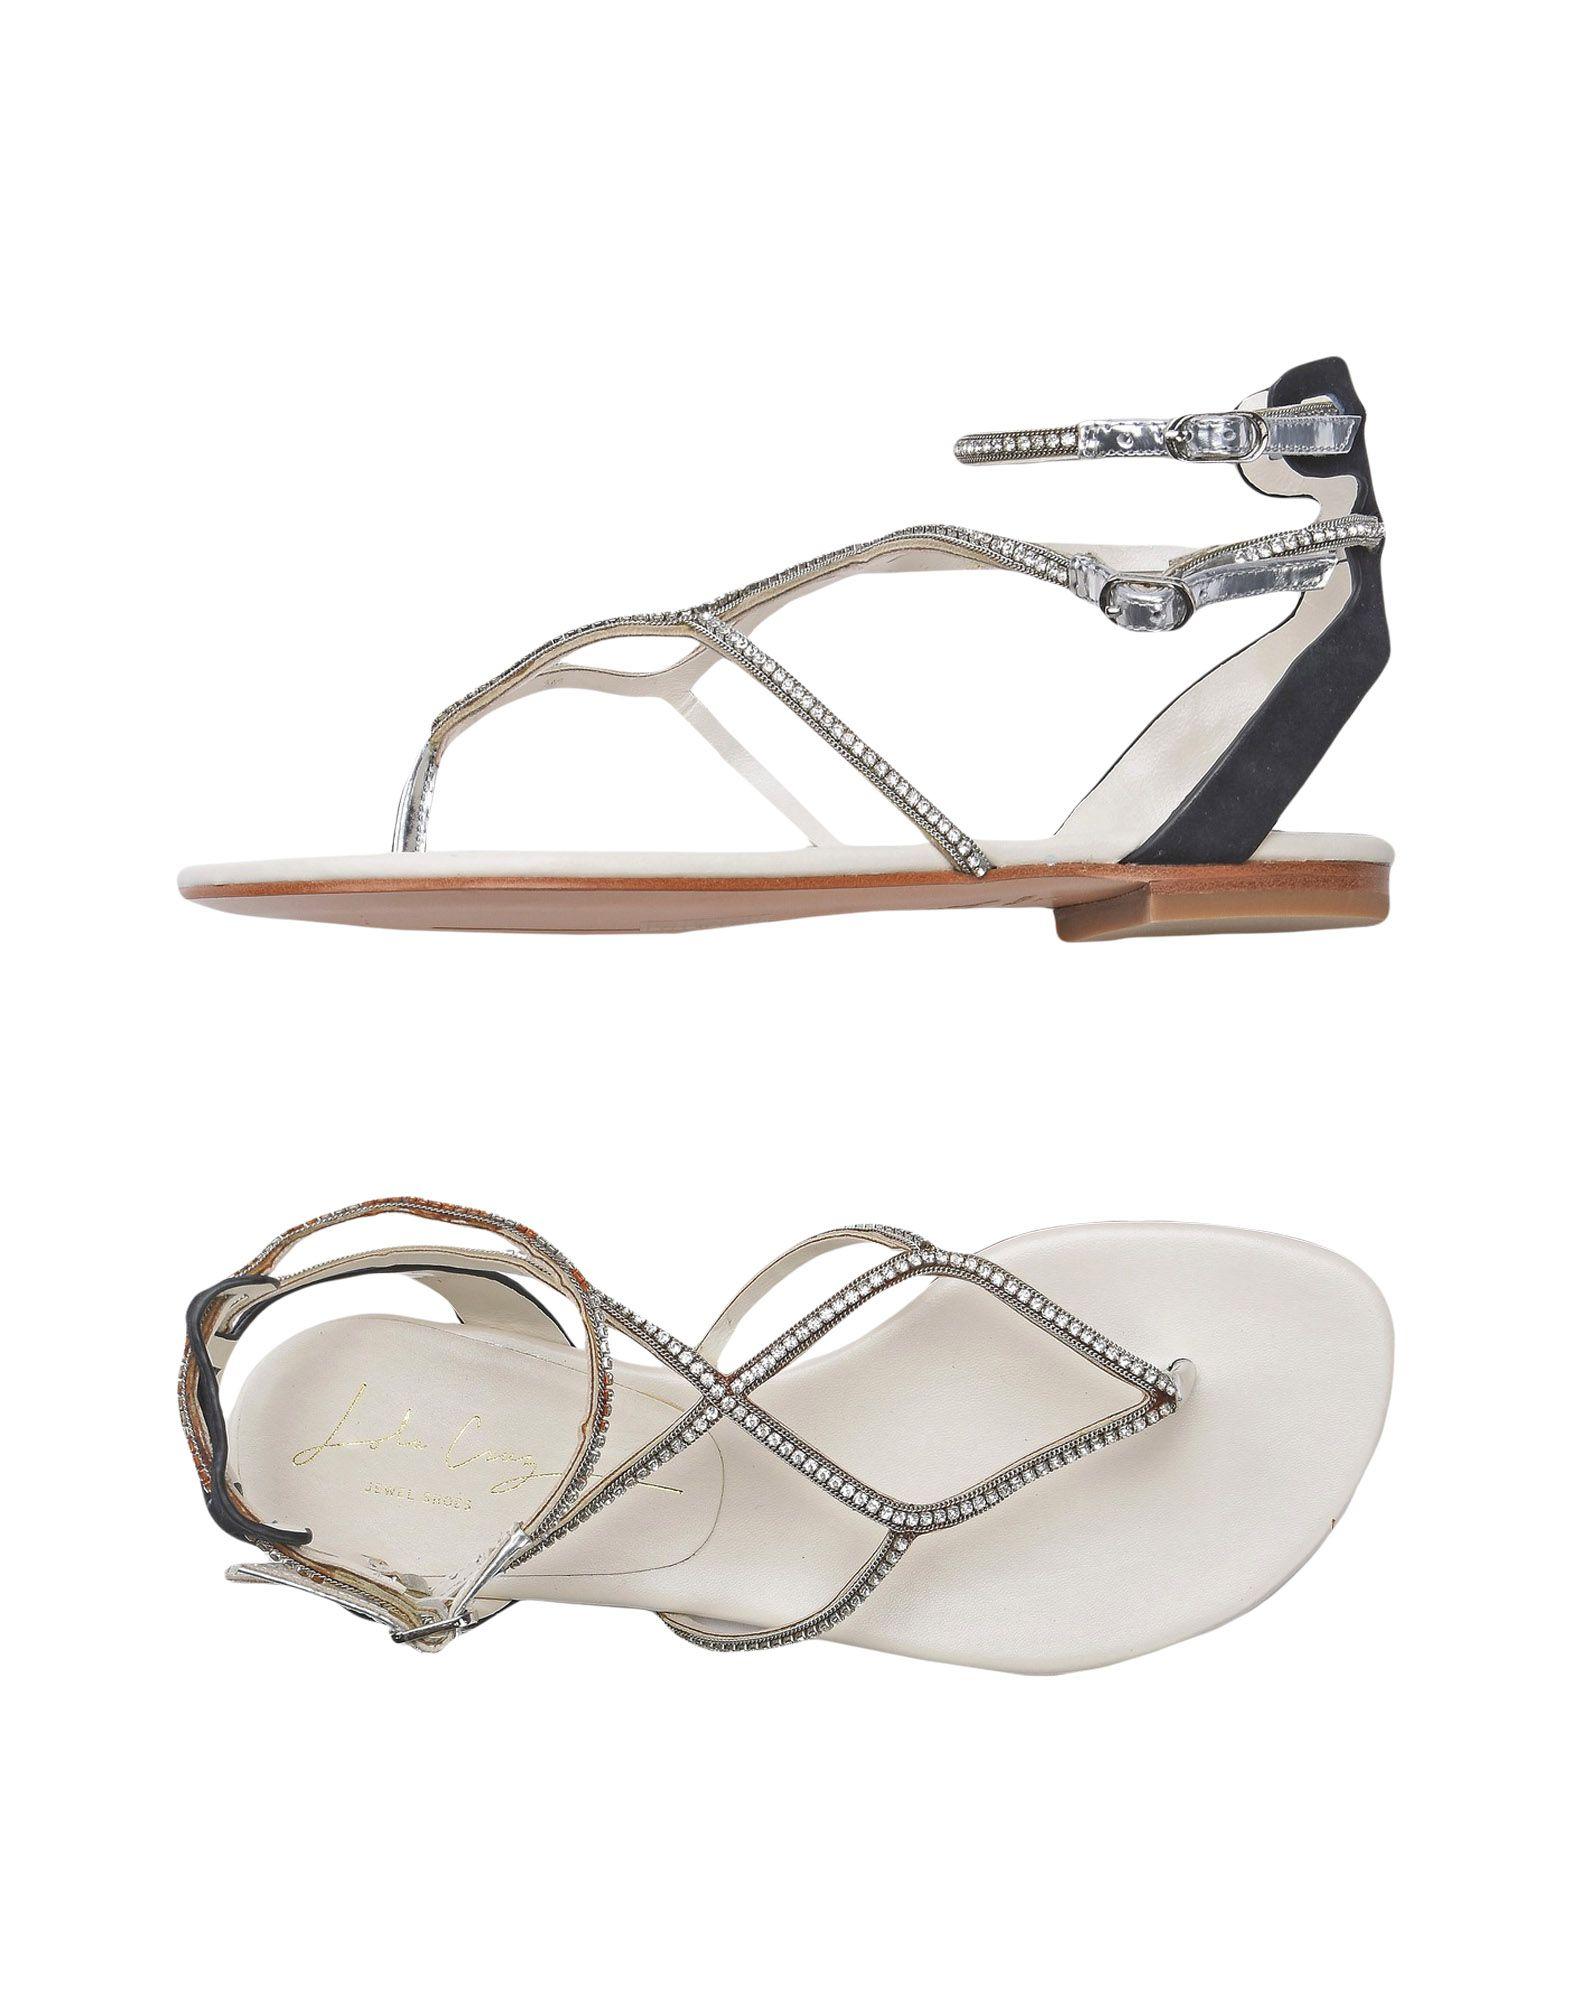 Lola Cruz Dianetten Damen Gute  11347141QA Gute Damen Qualität beliebte Schuhe 4db70b